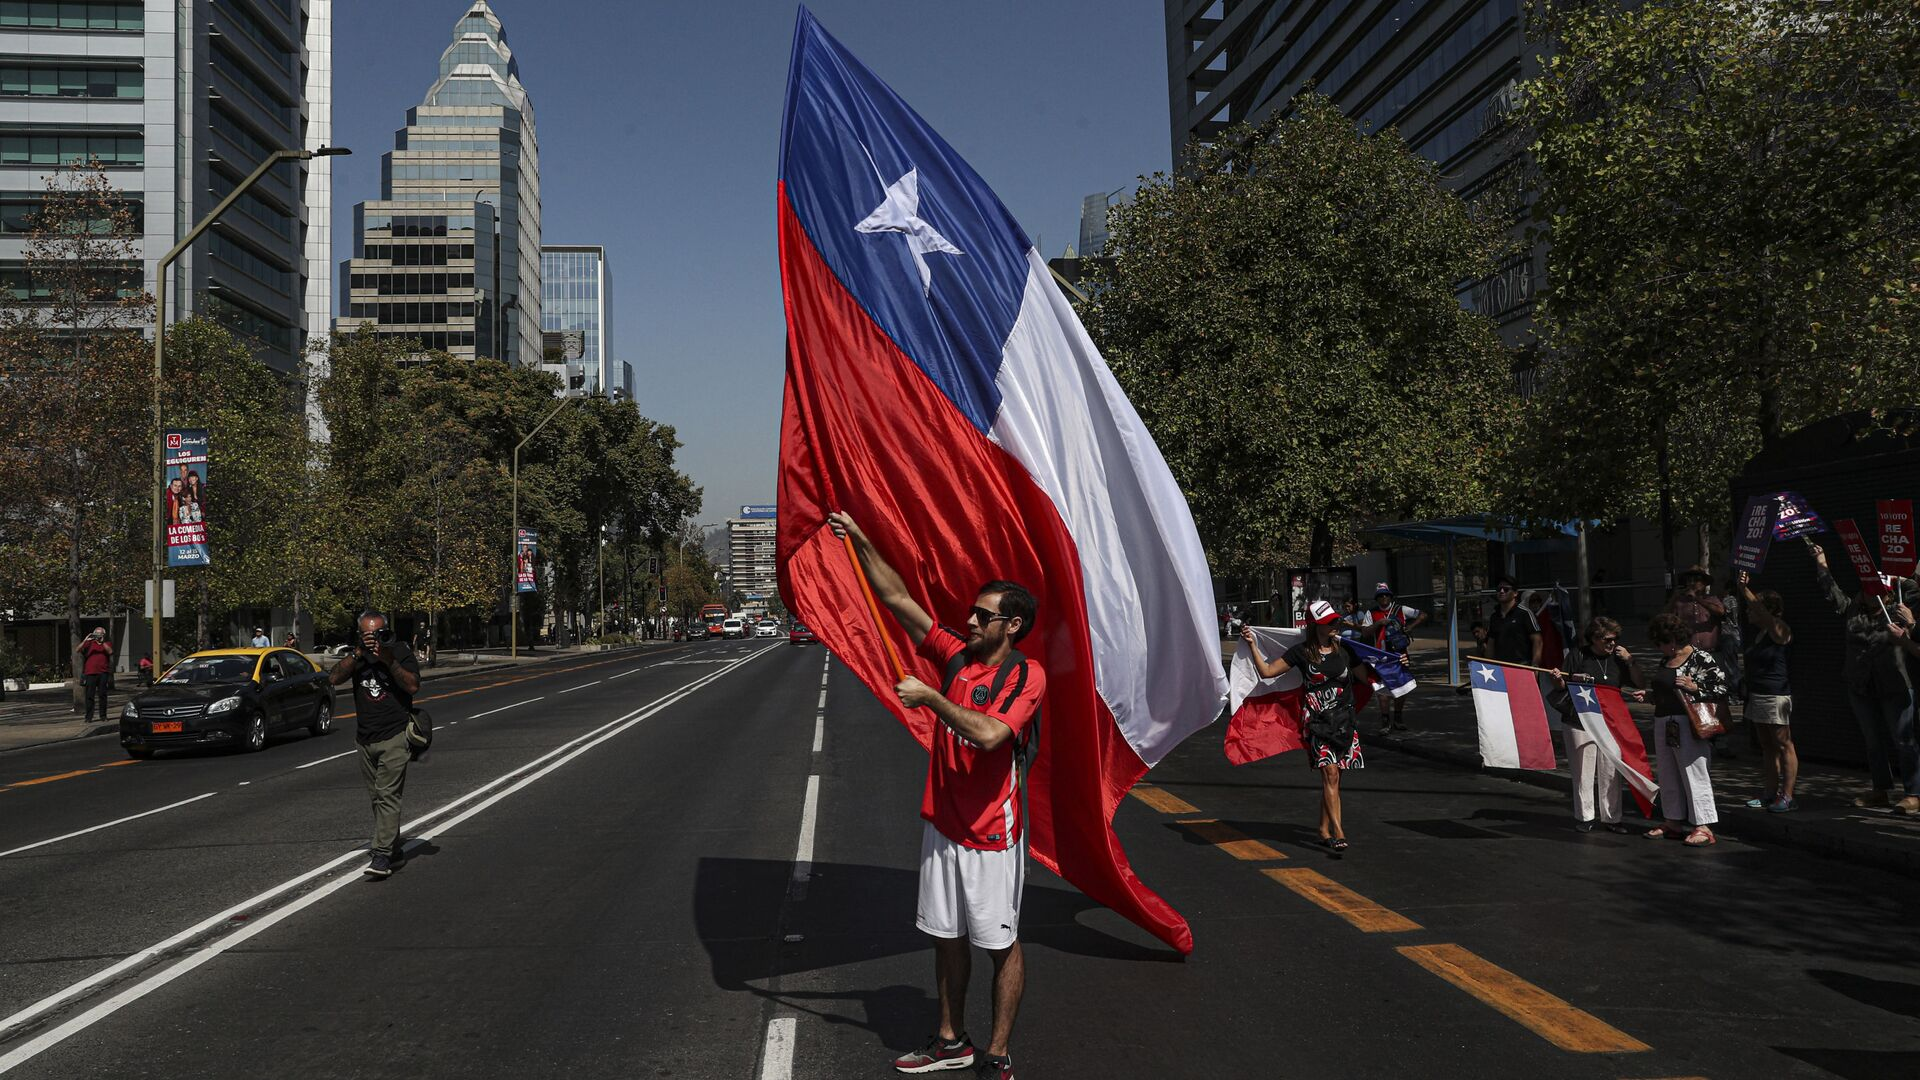 Un manifestante con la bandera de Chile - Sputnik Mundo, 1920, 04.07.2021